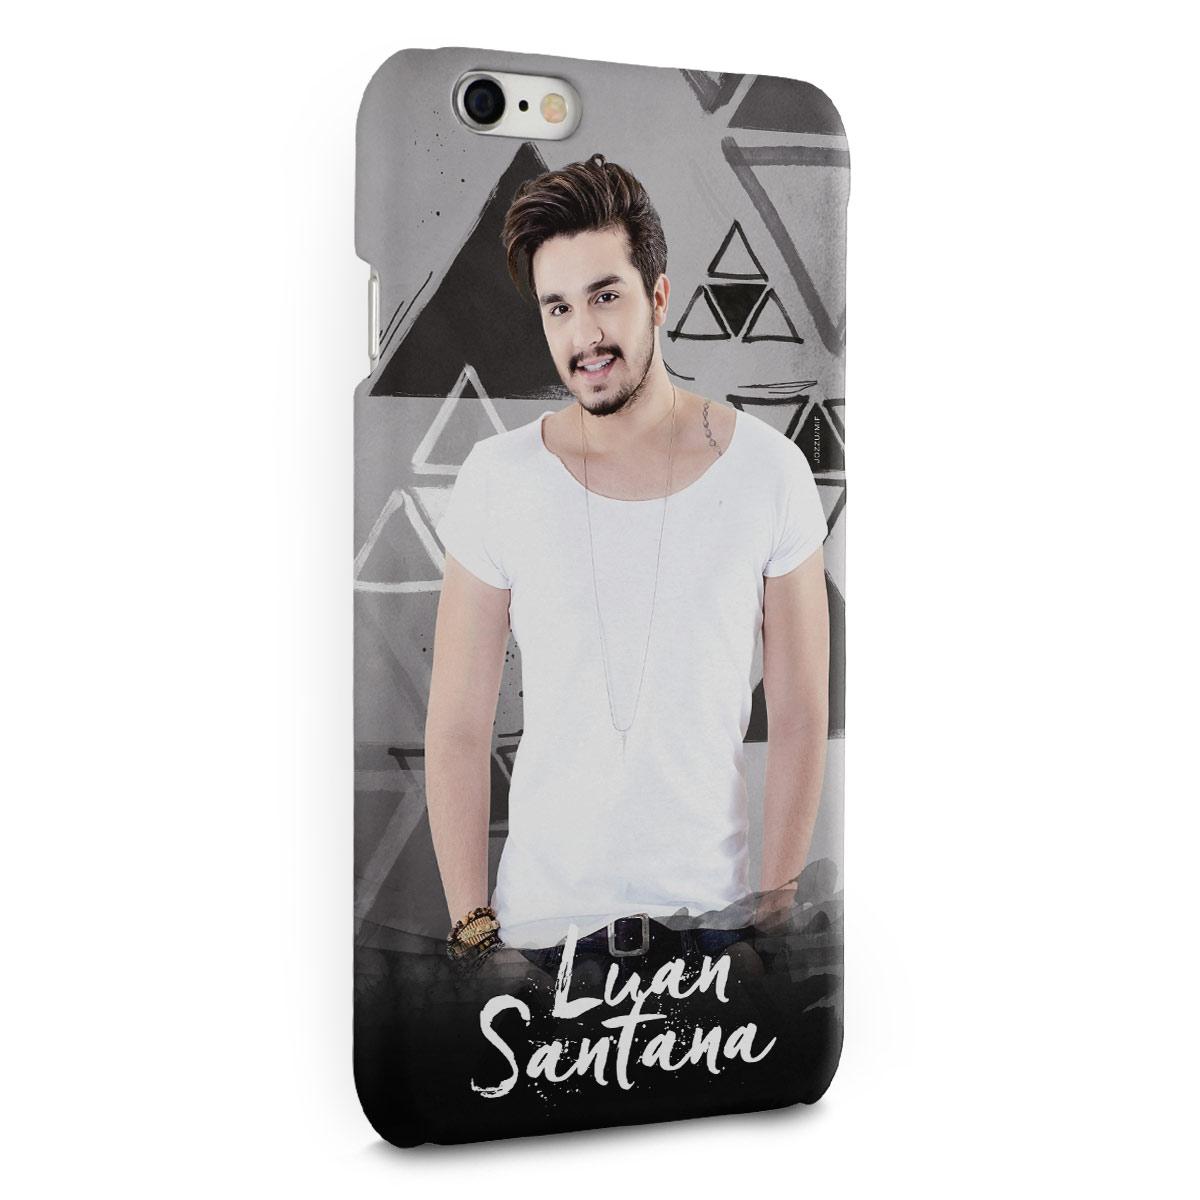 Capa para iPhone 6/6S Plus Luan Santana Picture